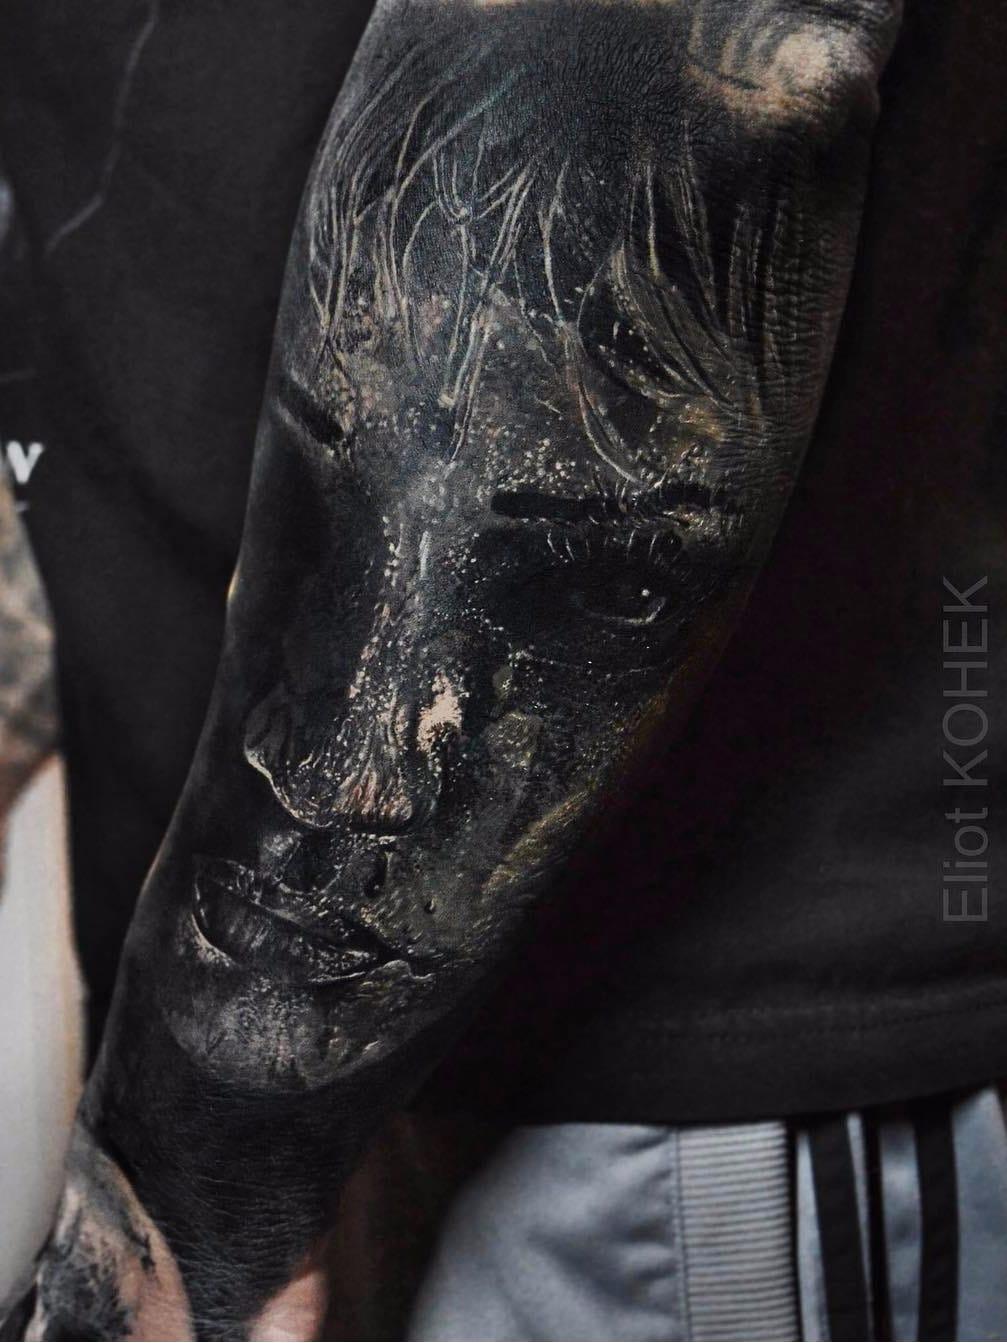 Por Eliot Kohek #EliotKohek #gringo #realismo #realism #pretoecinza #blackandgrey #rosto #face #woman #mulher #retrato #portrait #dark #terror #horror